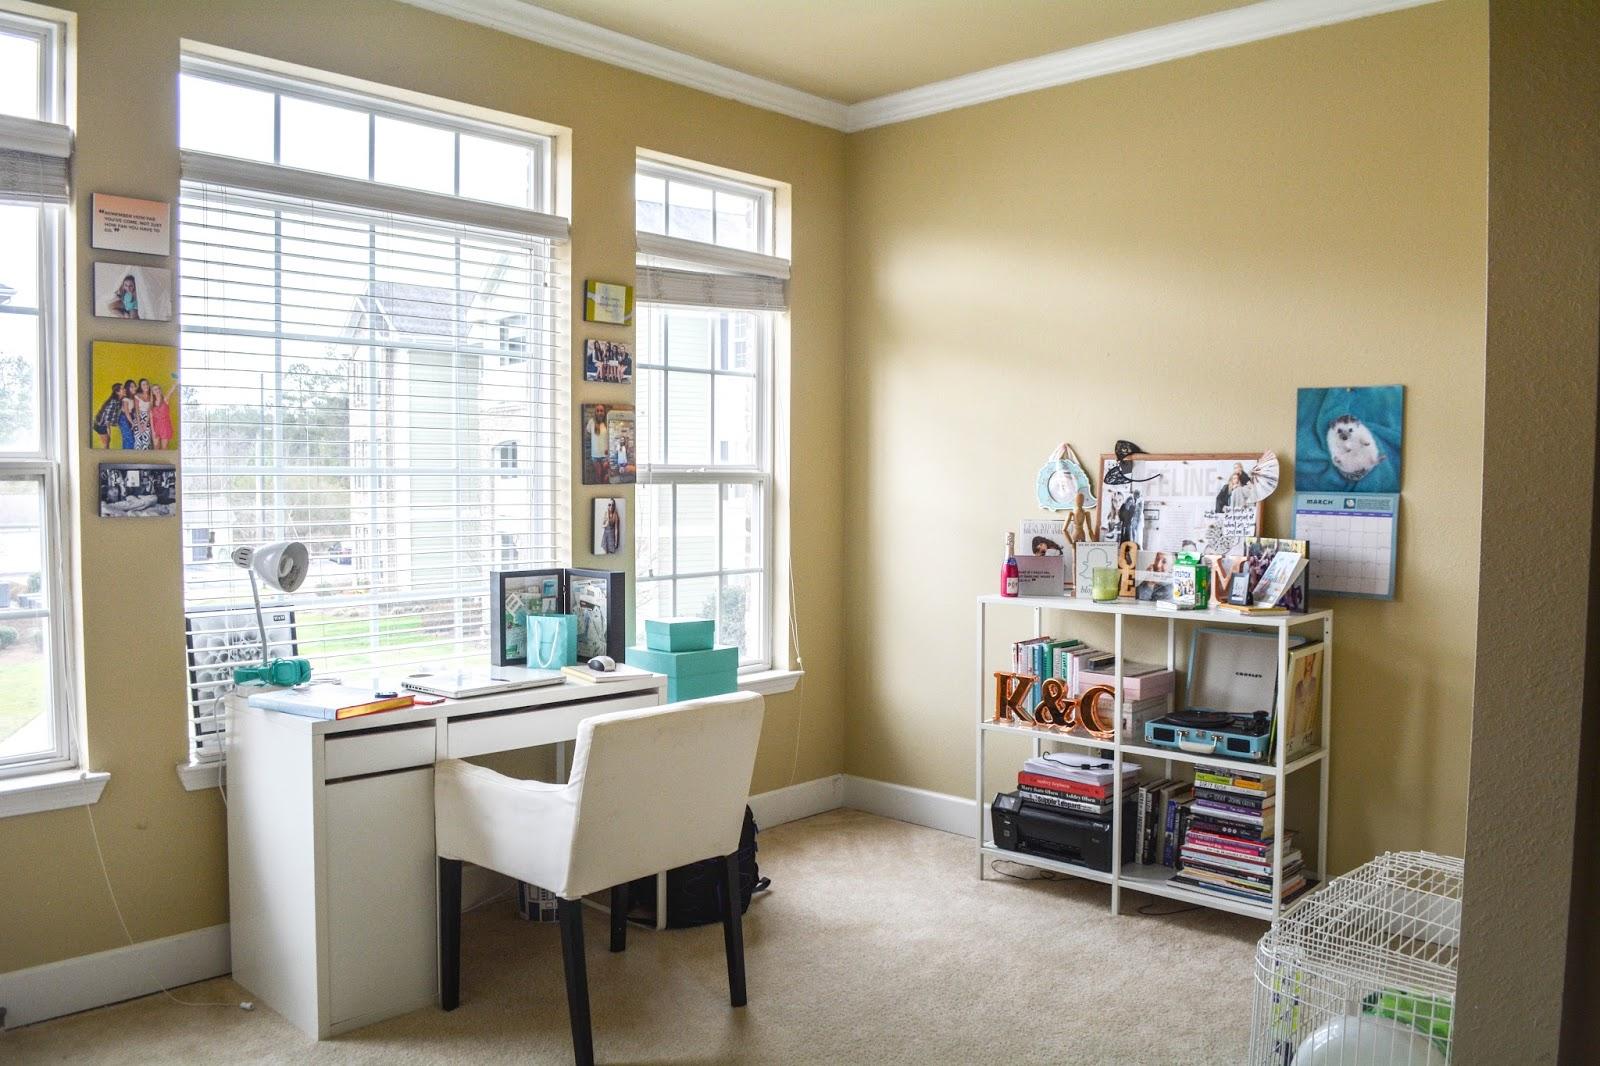 Apartment Tour: Sunroom/Office - FLINE BY KATSARIS